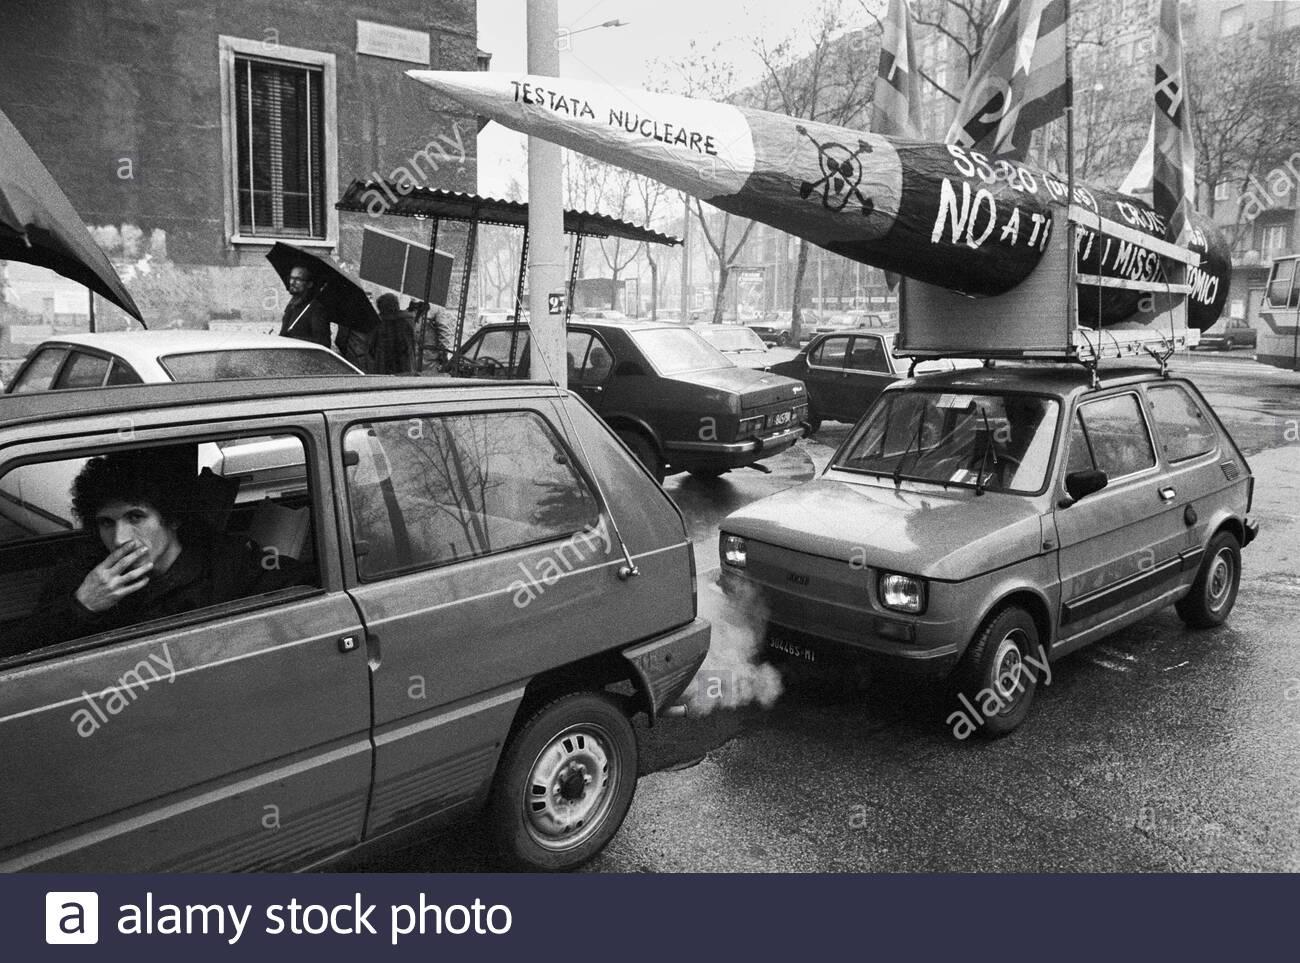 Corvetto 1984, Piazzale Gabrio (Gabriele) Rosa. Manifestazione anti missilistica nucleare.